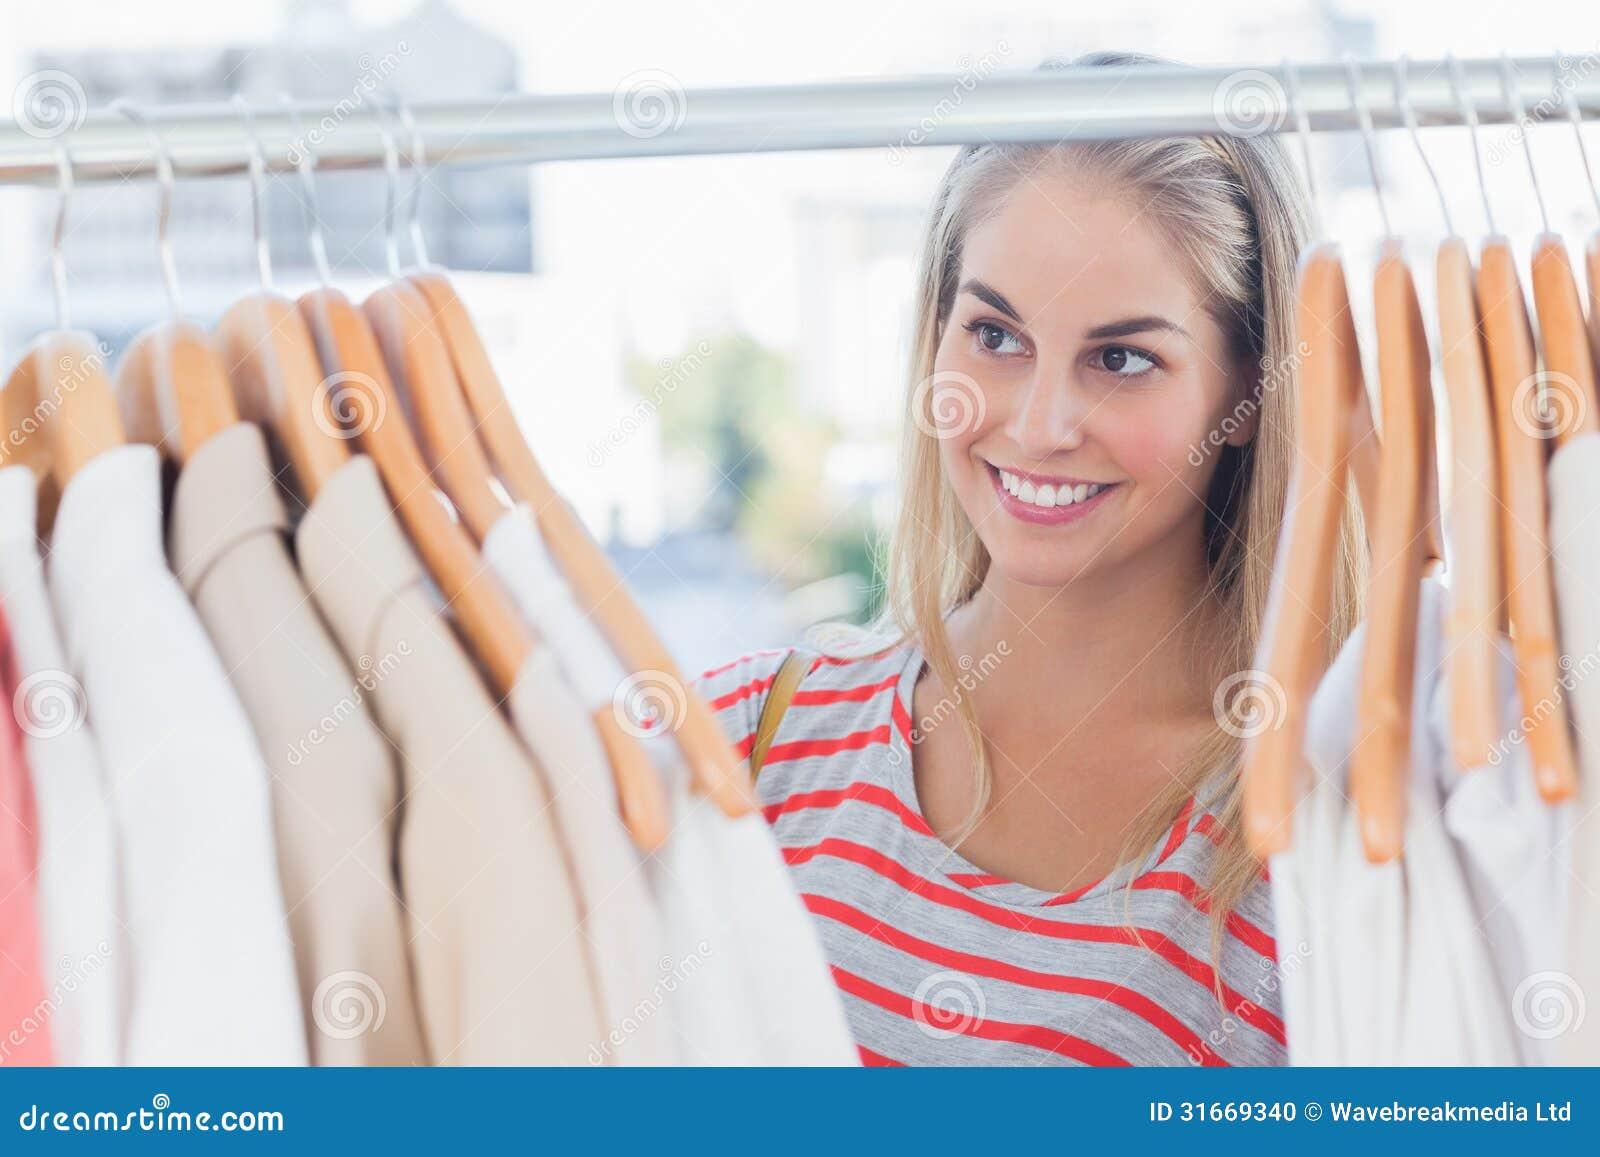 Summation: Personalization: The Store Clerk vs. The Machine